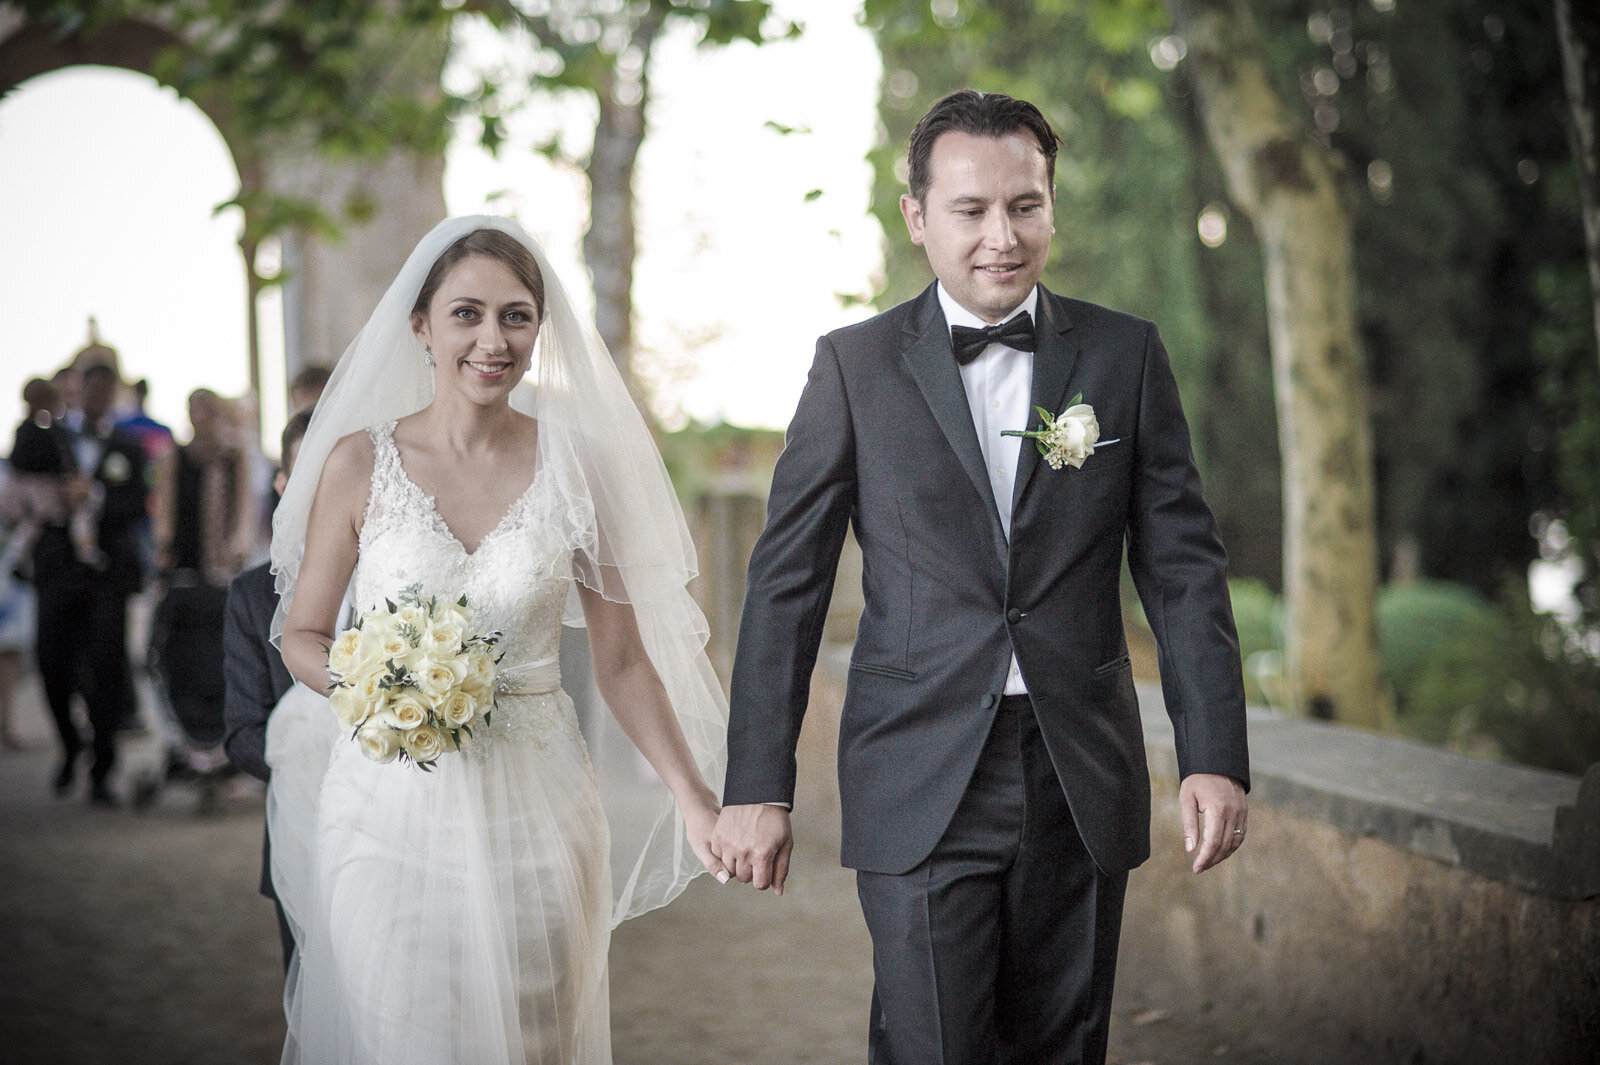 Russian Wedding in Villa Cimbrone Costiera Amalfitana 18.jpg